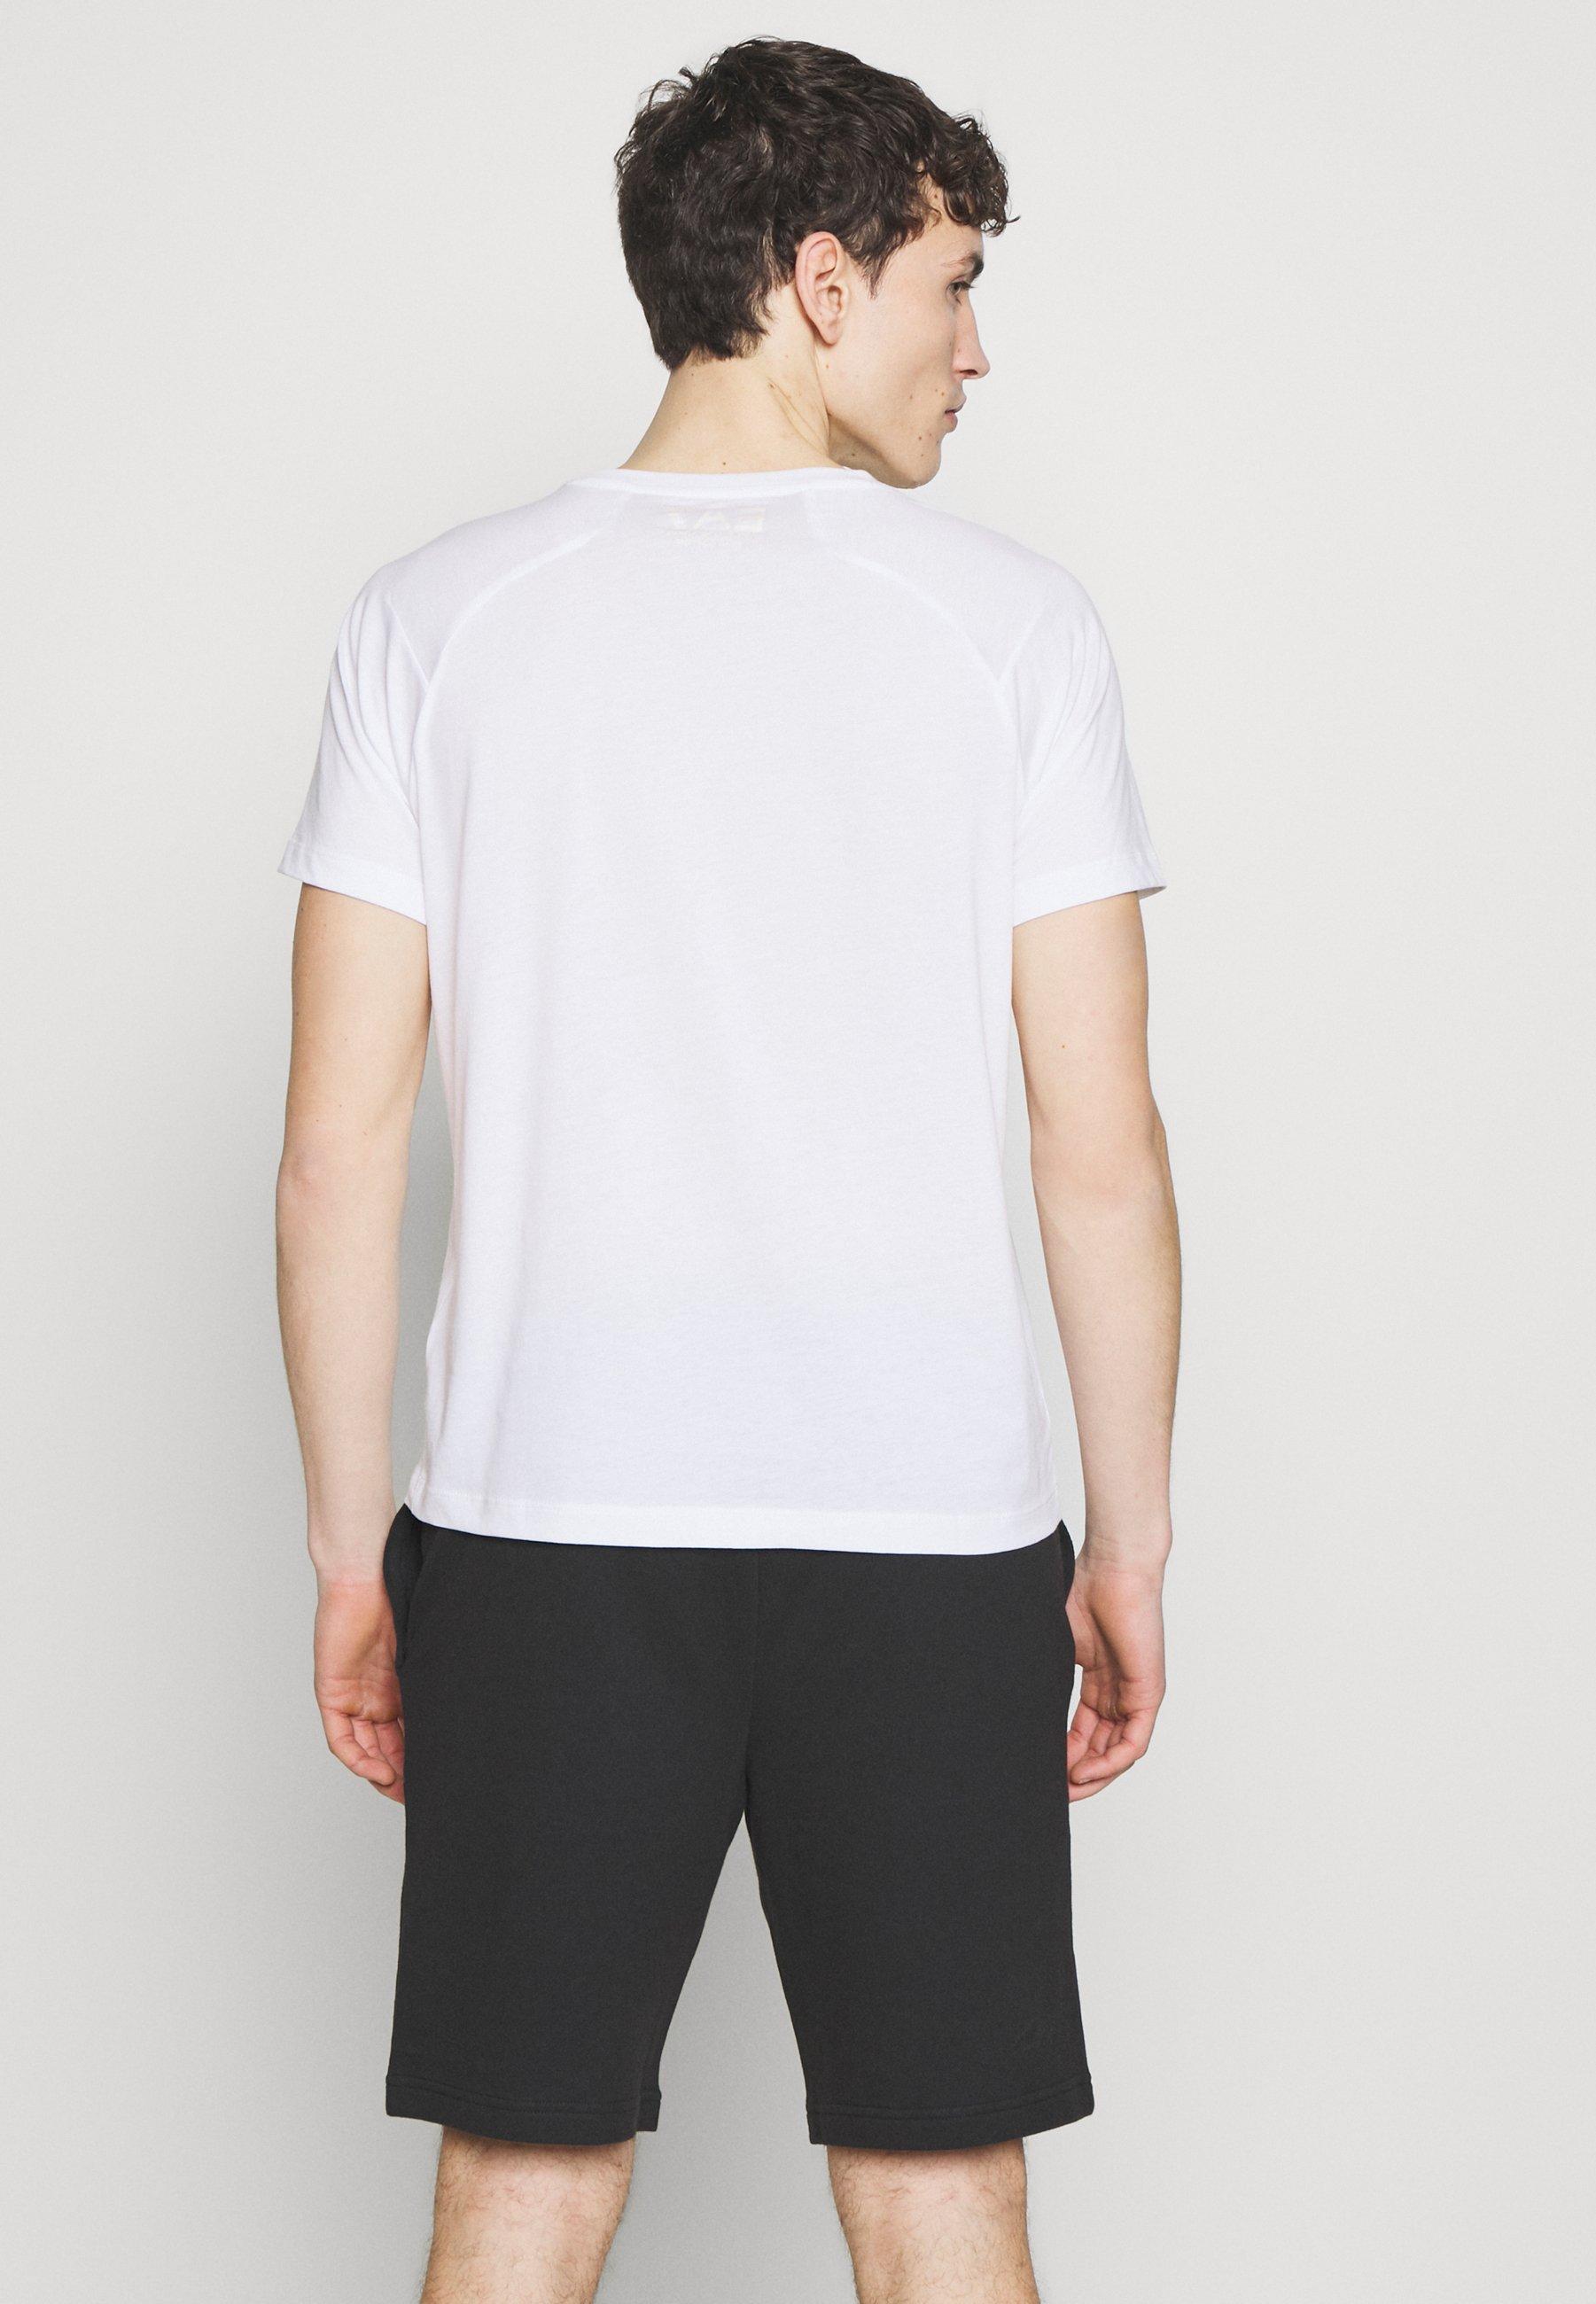 EA7 Emporio Armani Print T-shirt - white 9OQ9T